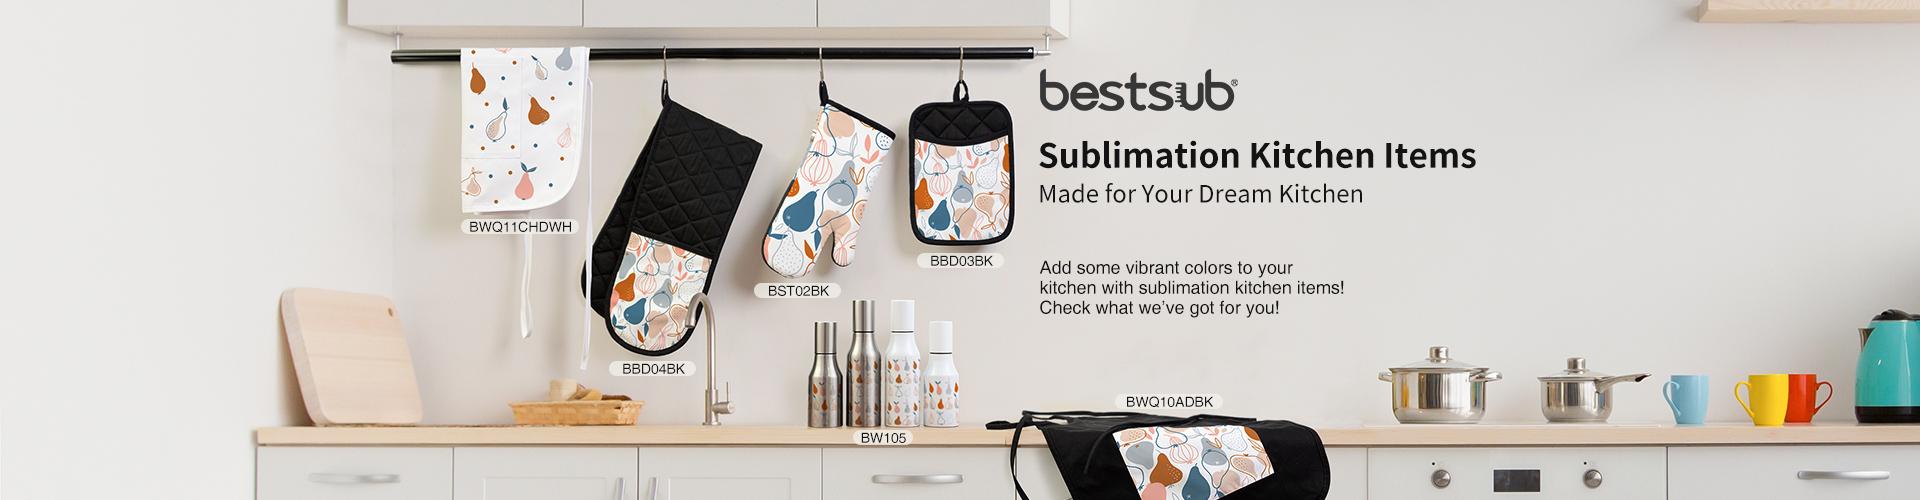 2021-07-06_Sublimation_Kitchen_Items_new_web